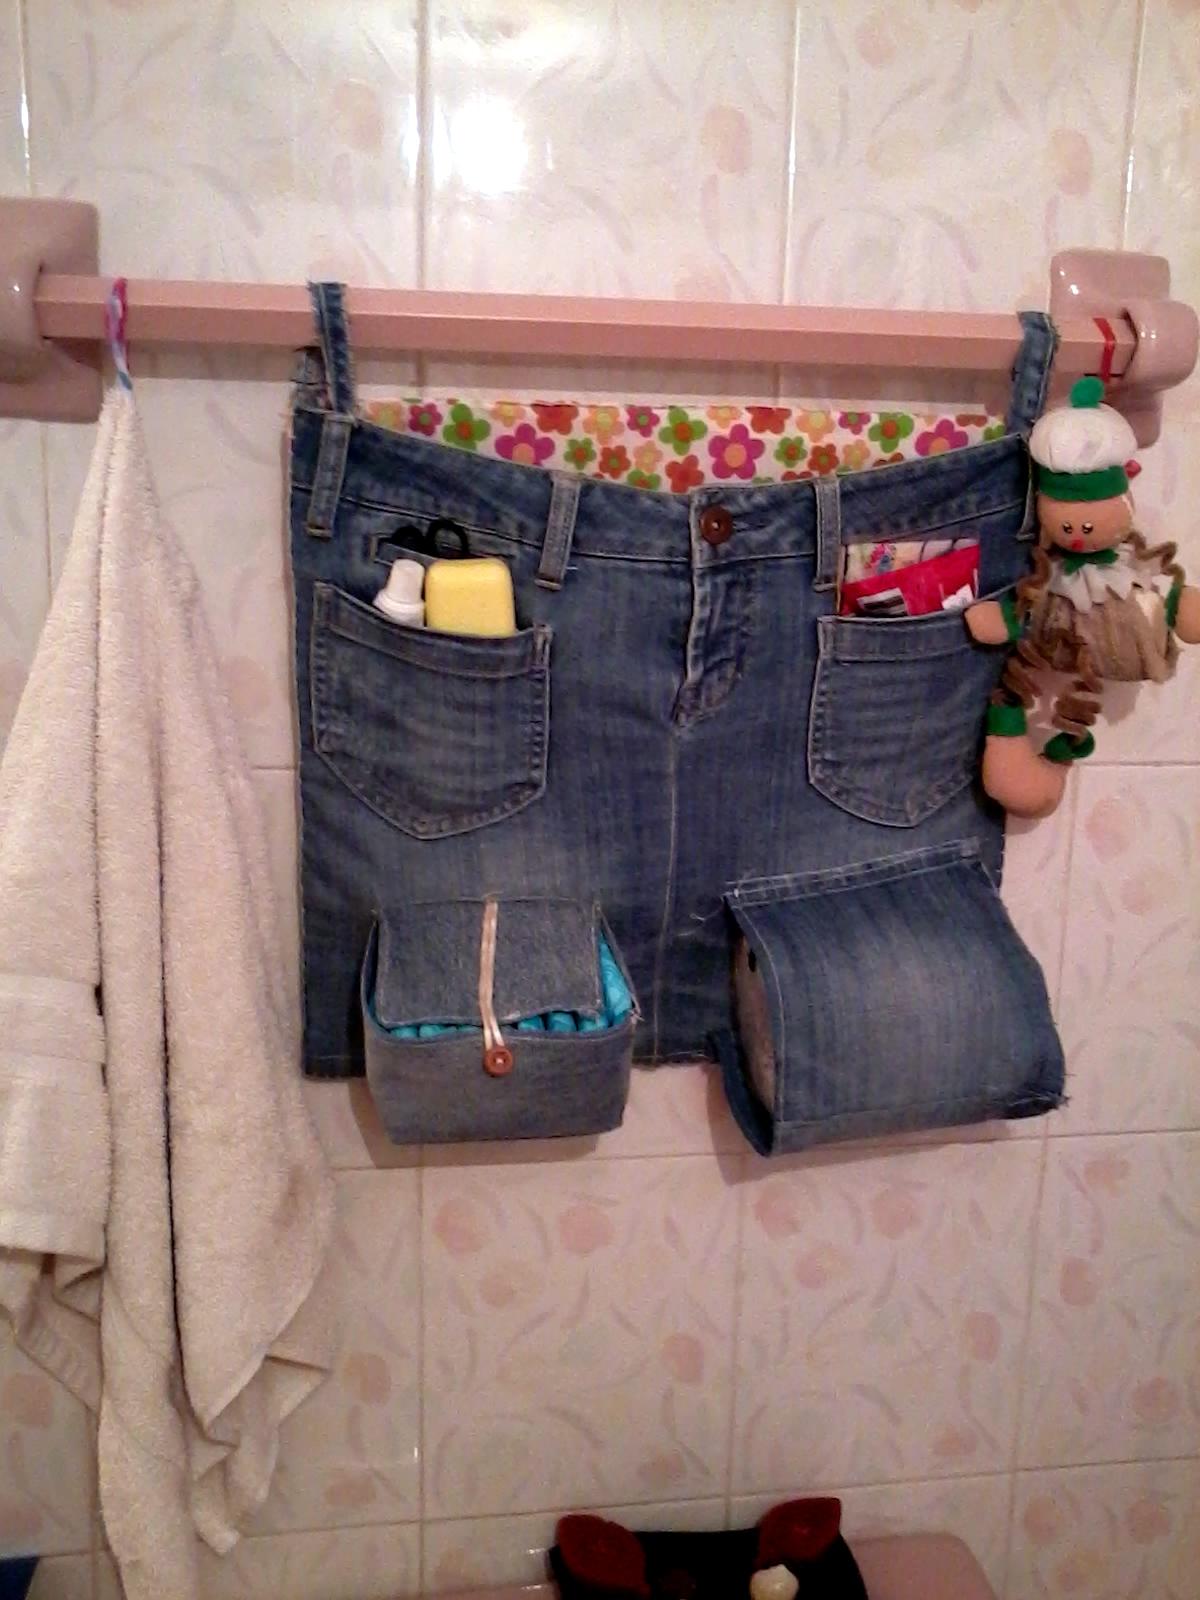 Organizador De Baño En Tela Paso A Paso:de un cuadro de triplay o aglomerado de madera, unos jeans, tela